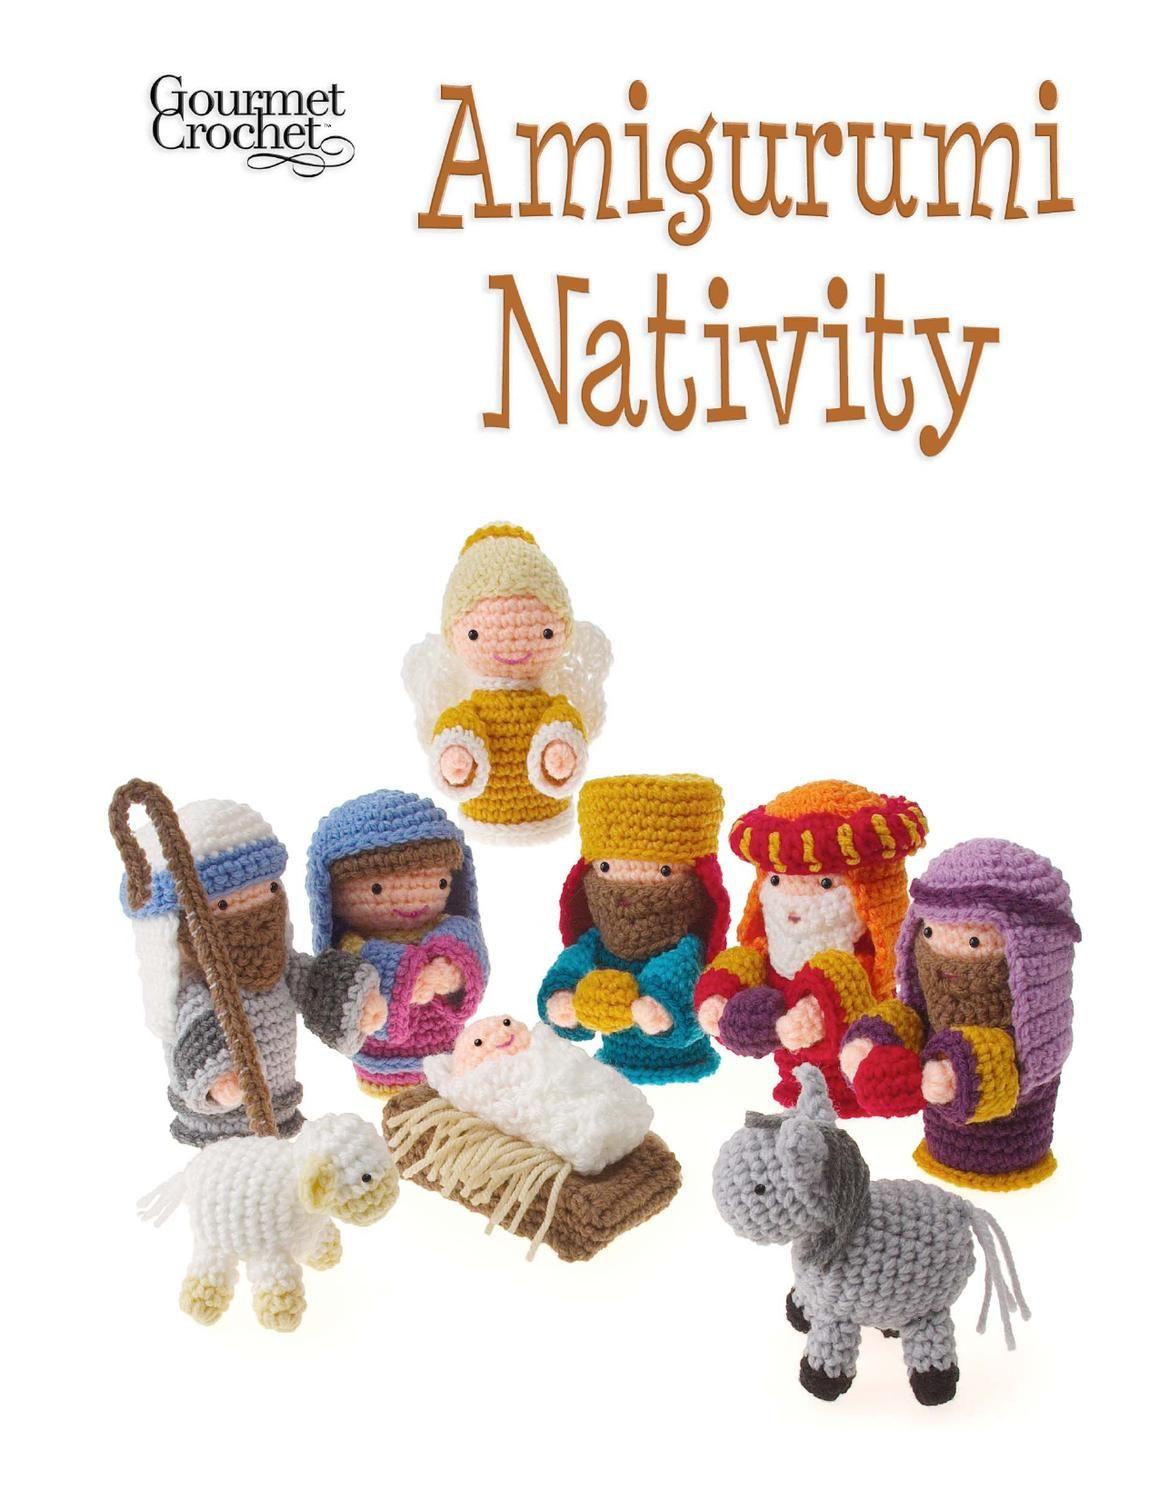 nacimiento crochet   Crochet e-magazines & books   Pinterest ...